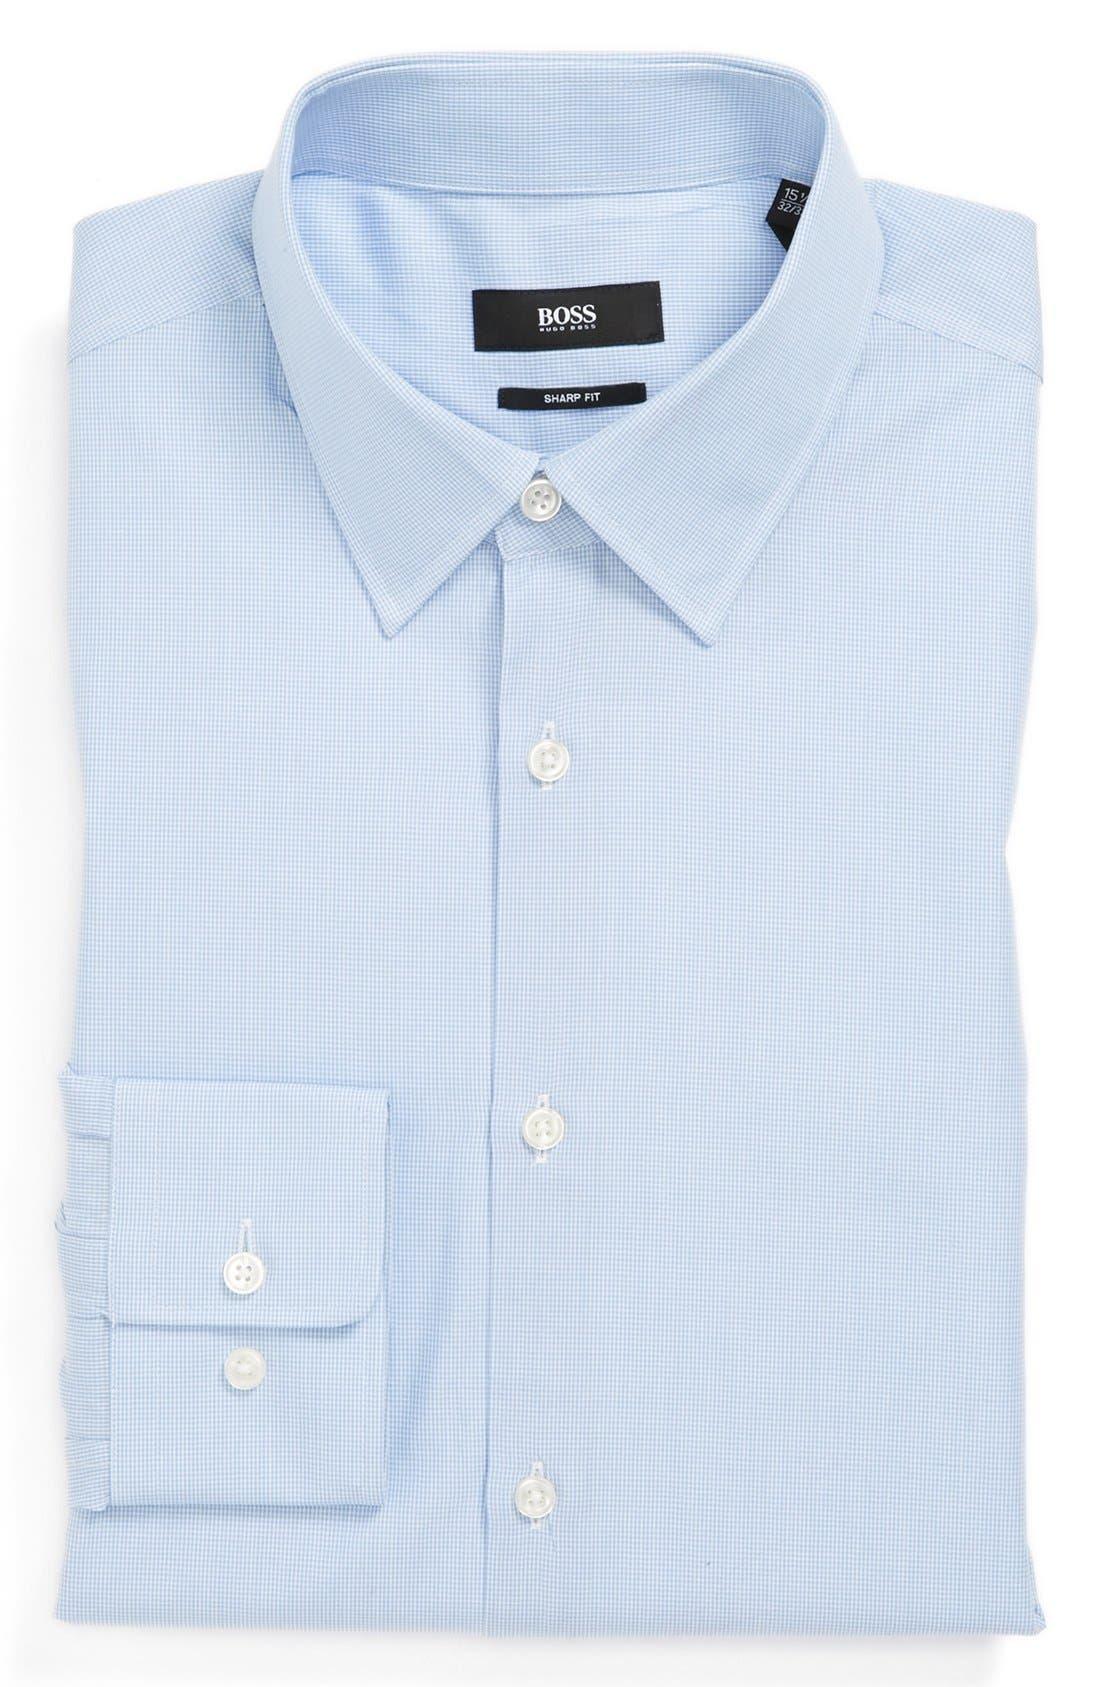 Main Image - BOSS 'Marlow' Sharp Fit Dress Shirt